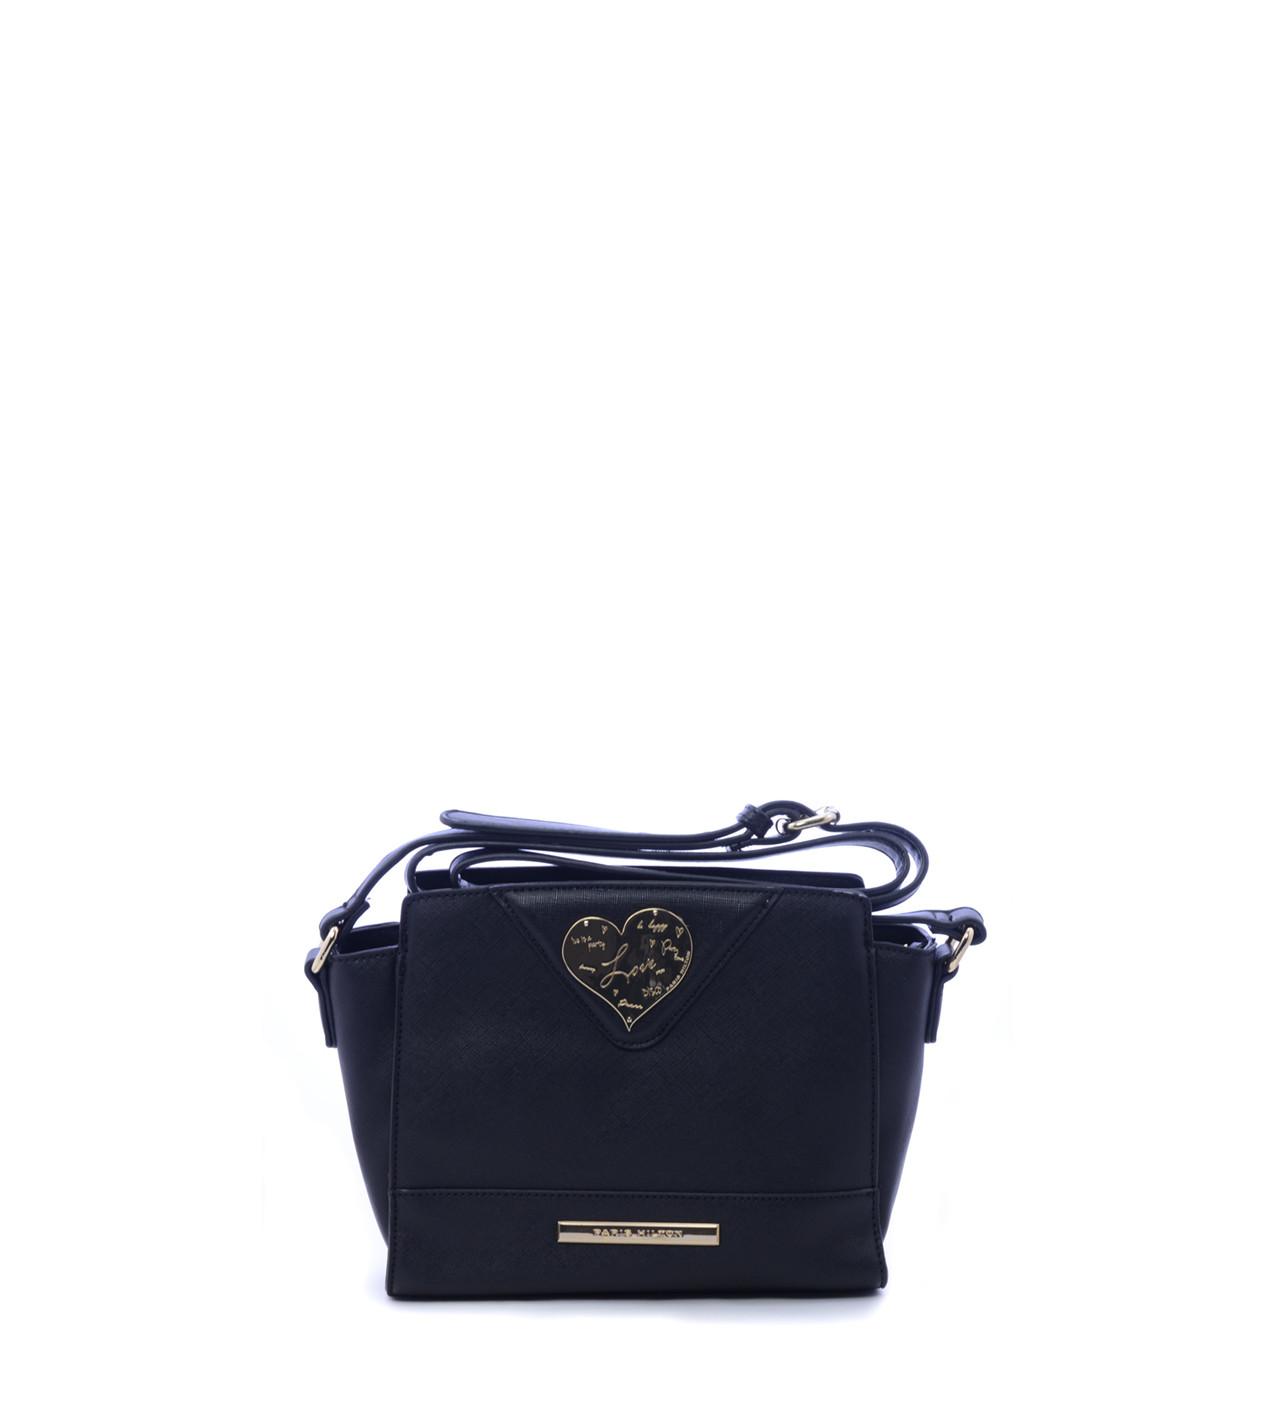 1f93636ab2 Paris Hilton Μαύρο Τσαντάκι Χιαστή (Bags)